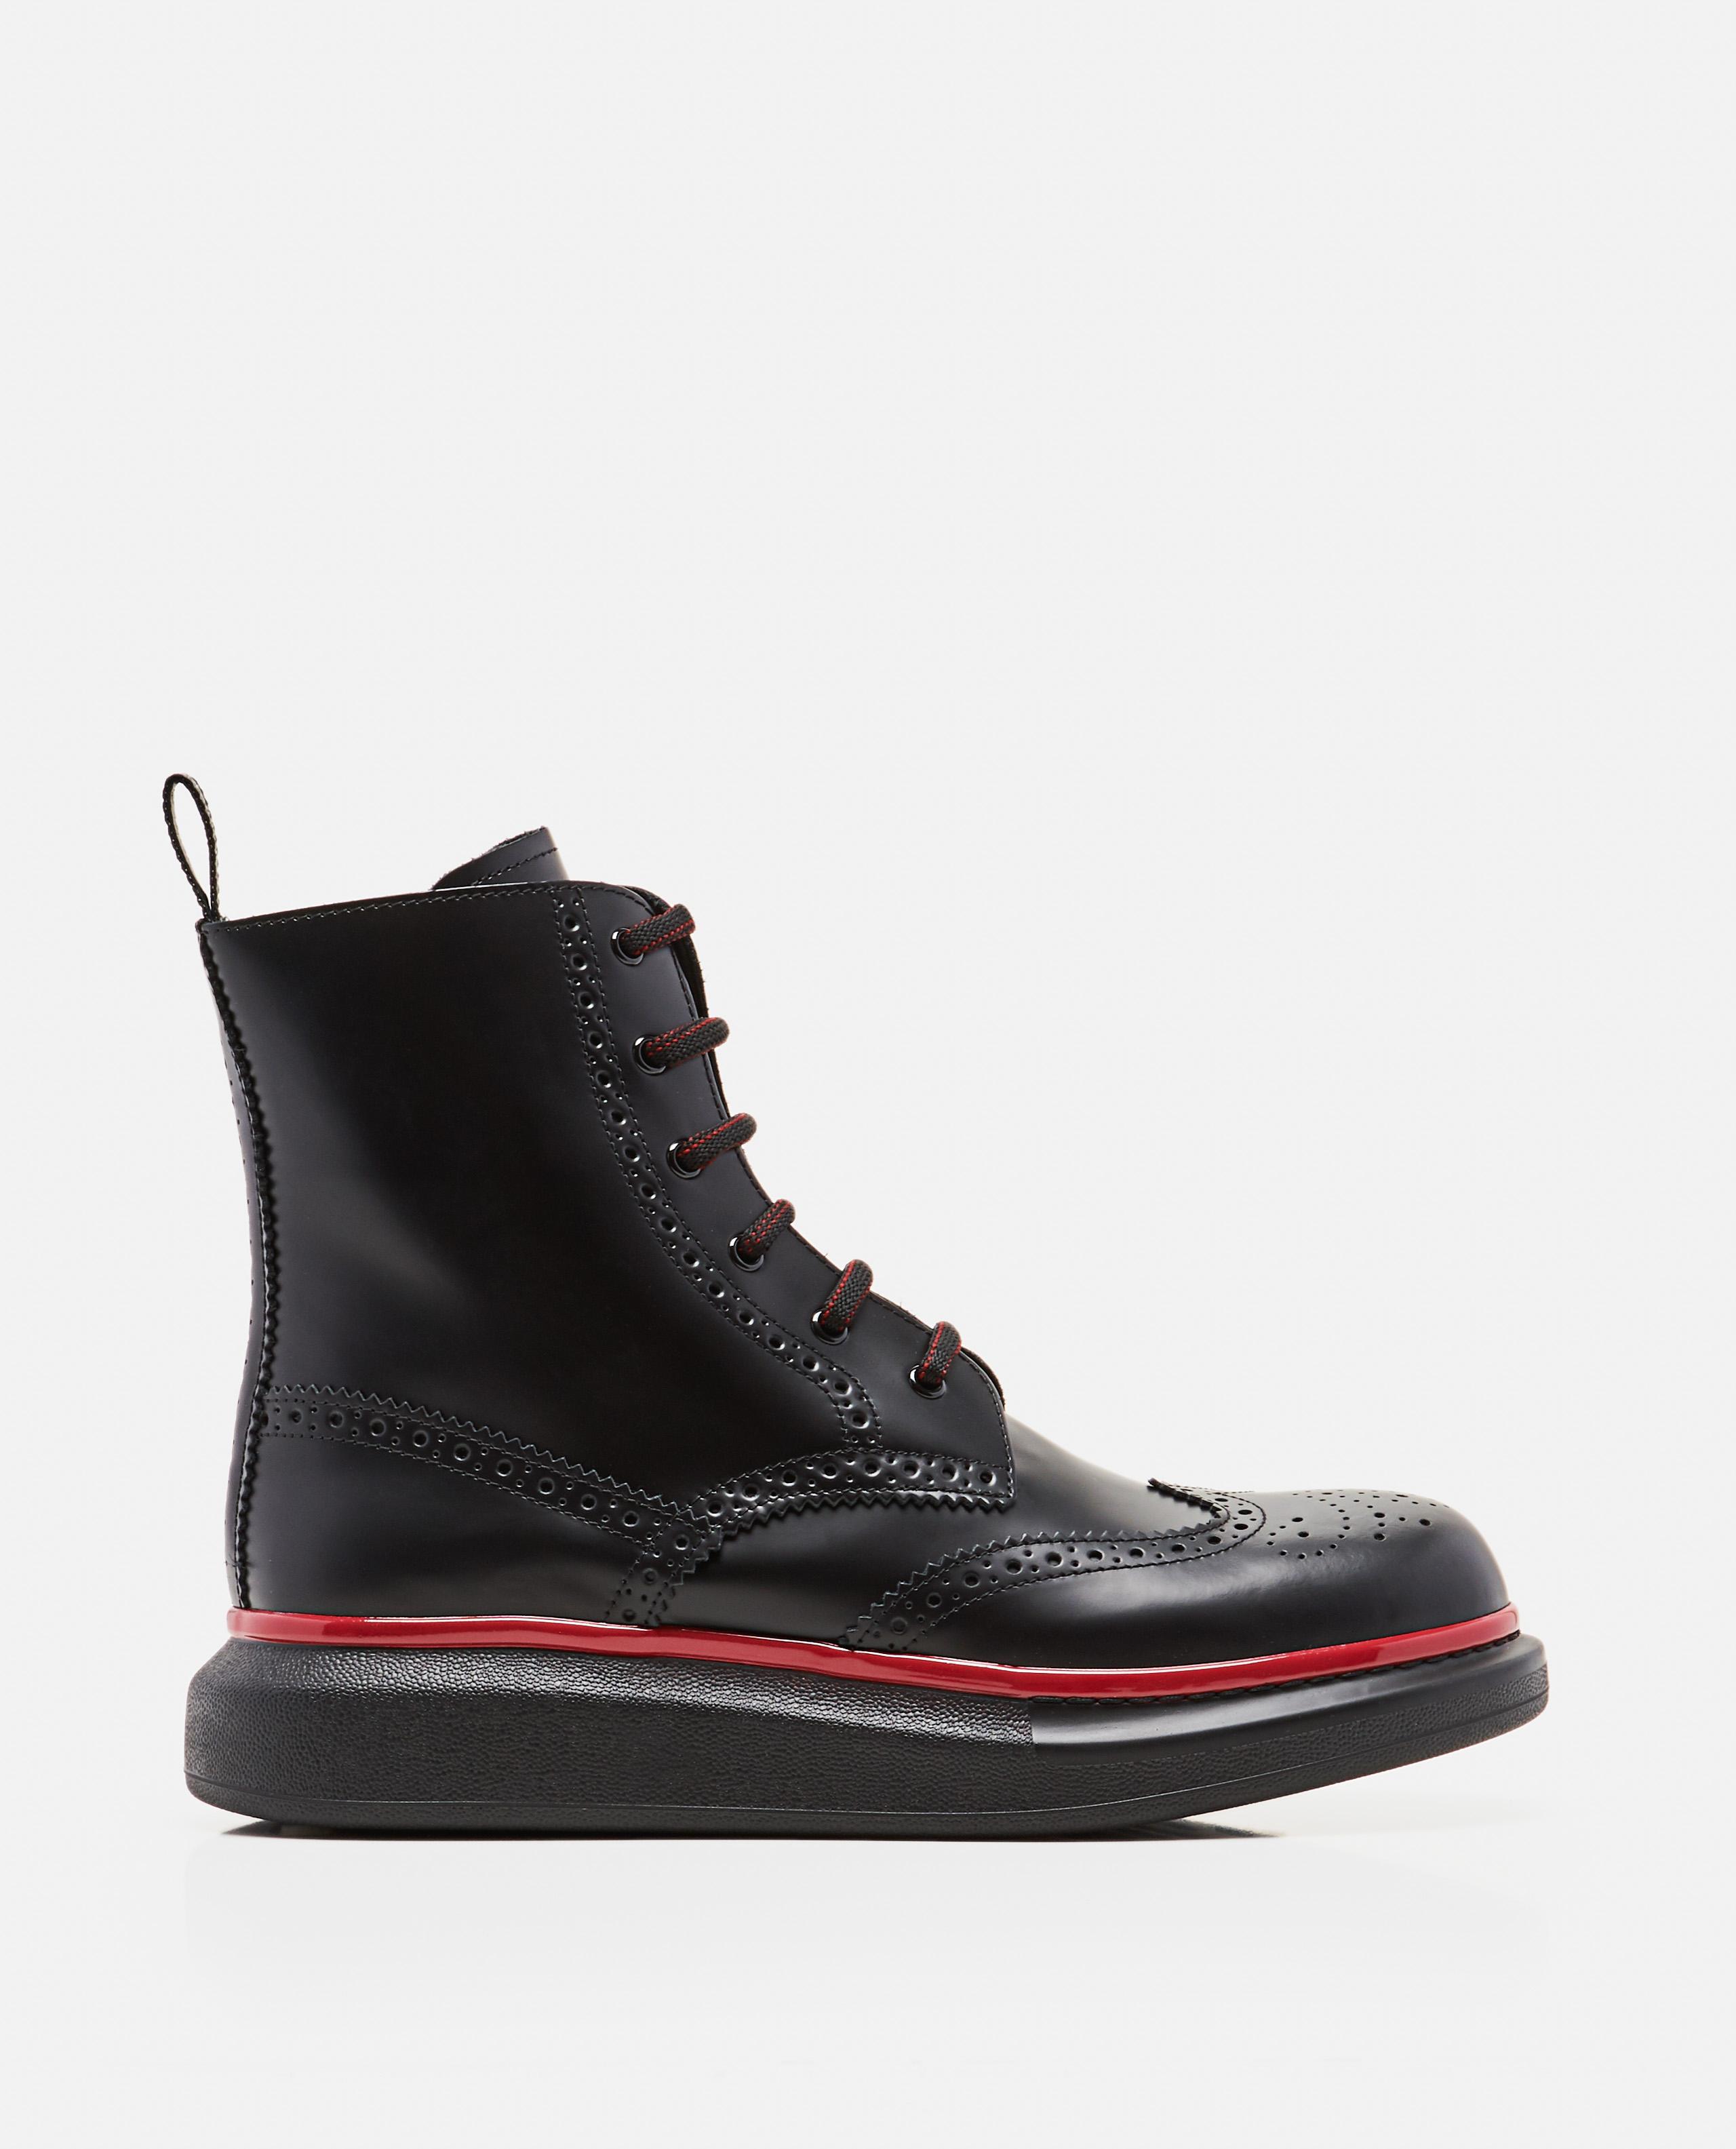 Hybrid boot